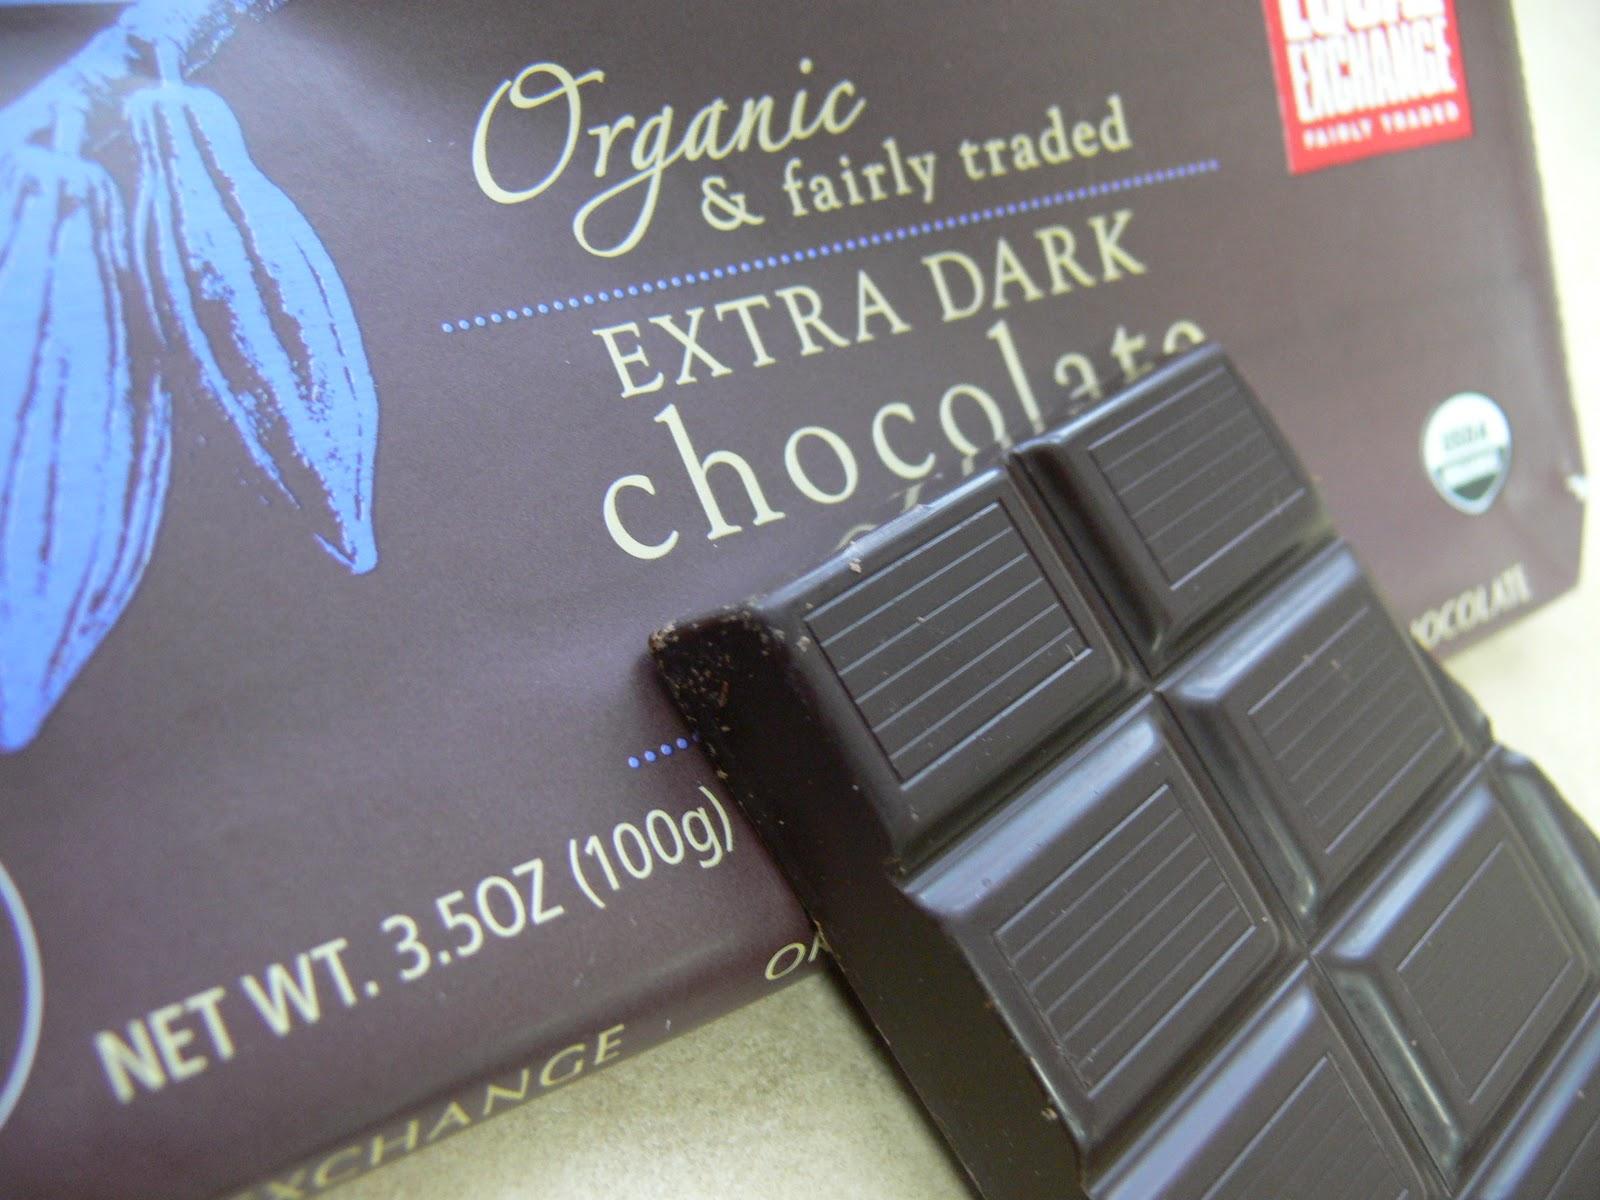 The Ultimate Chocolate Blog: January 2012